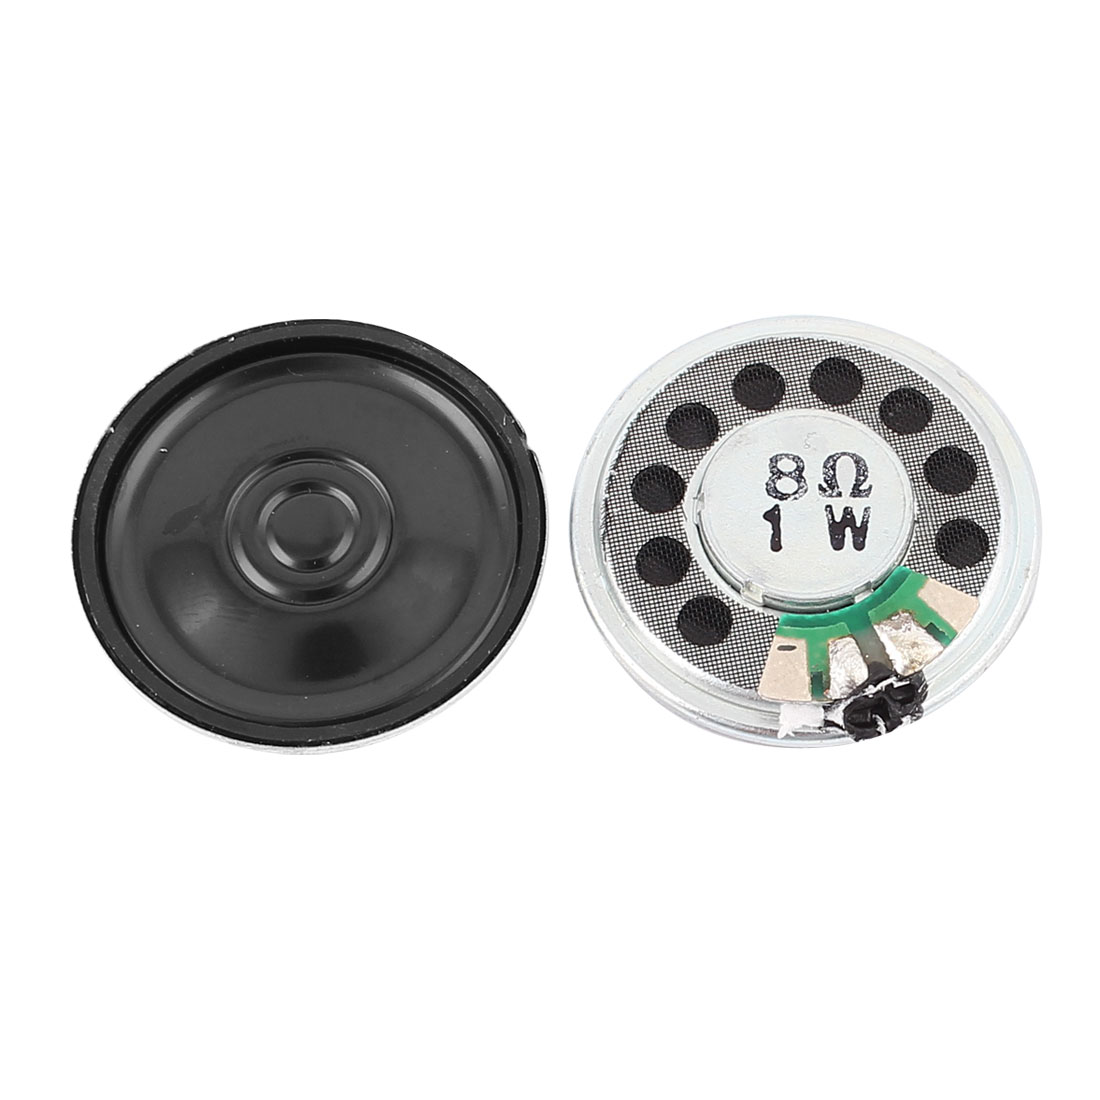 2 Pcs 1W 8 Ohm 30mm Round Inside Magnet Electronic Speaker Loudspeaker